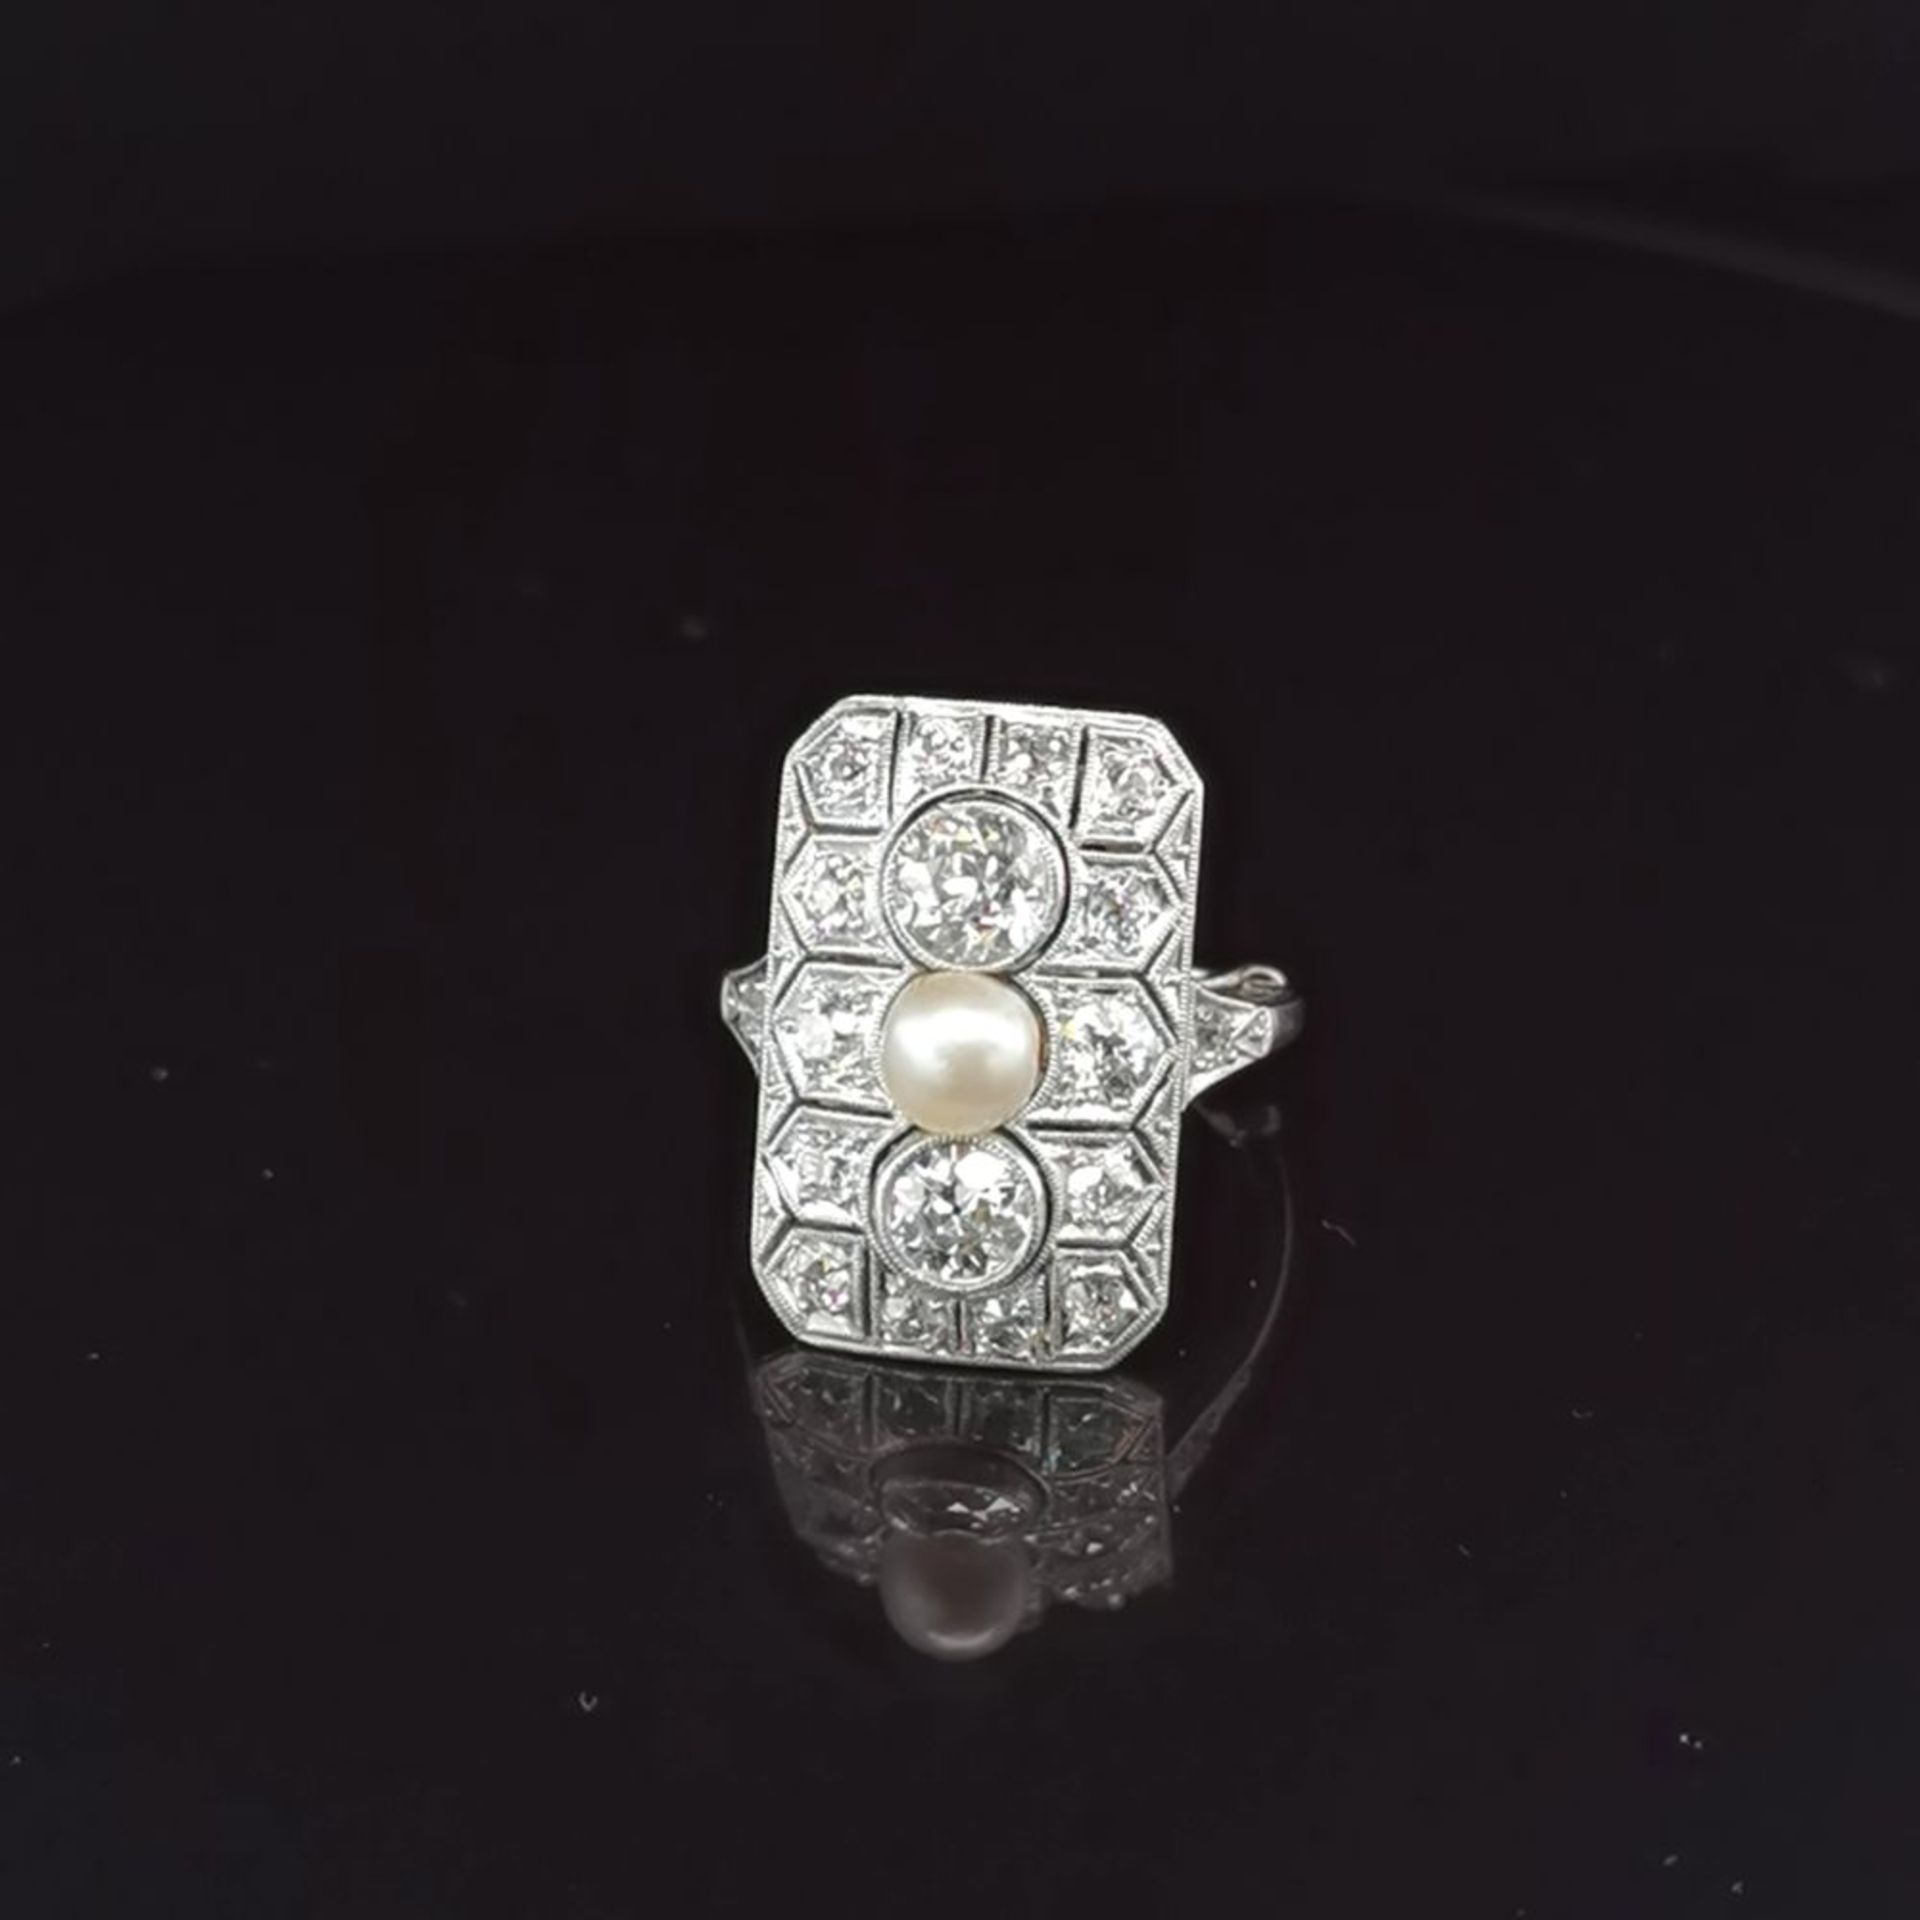 Perl-Diamant-Ring, 585 Weißgold 5,5